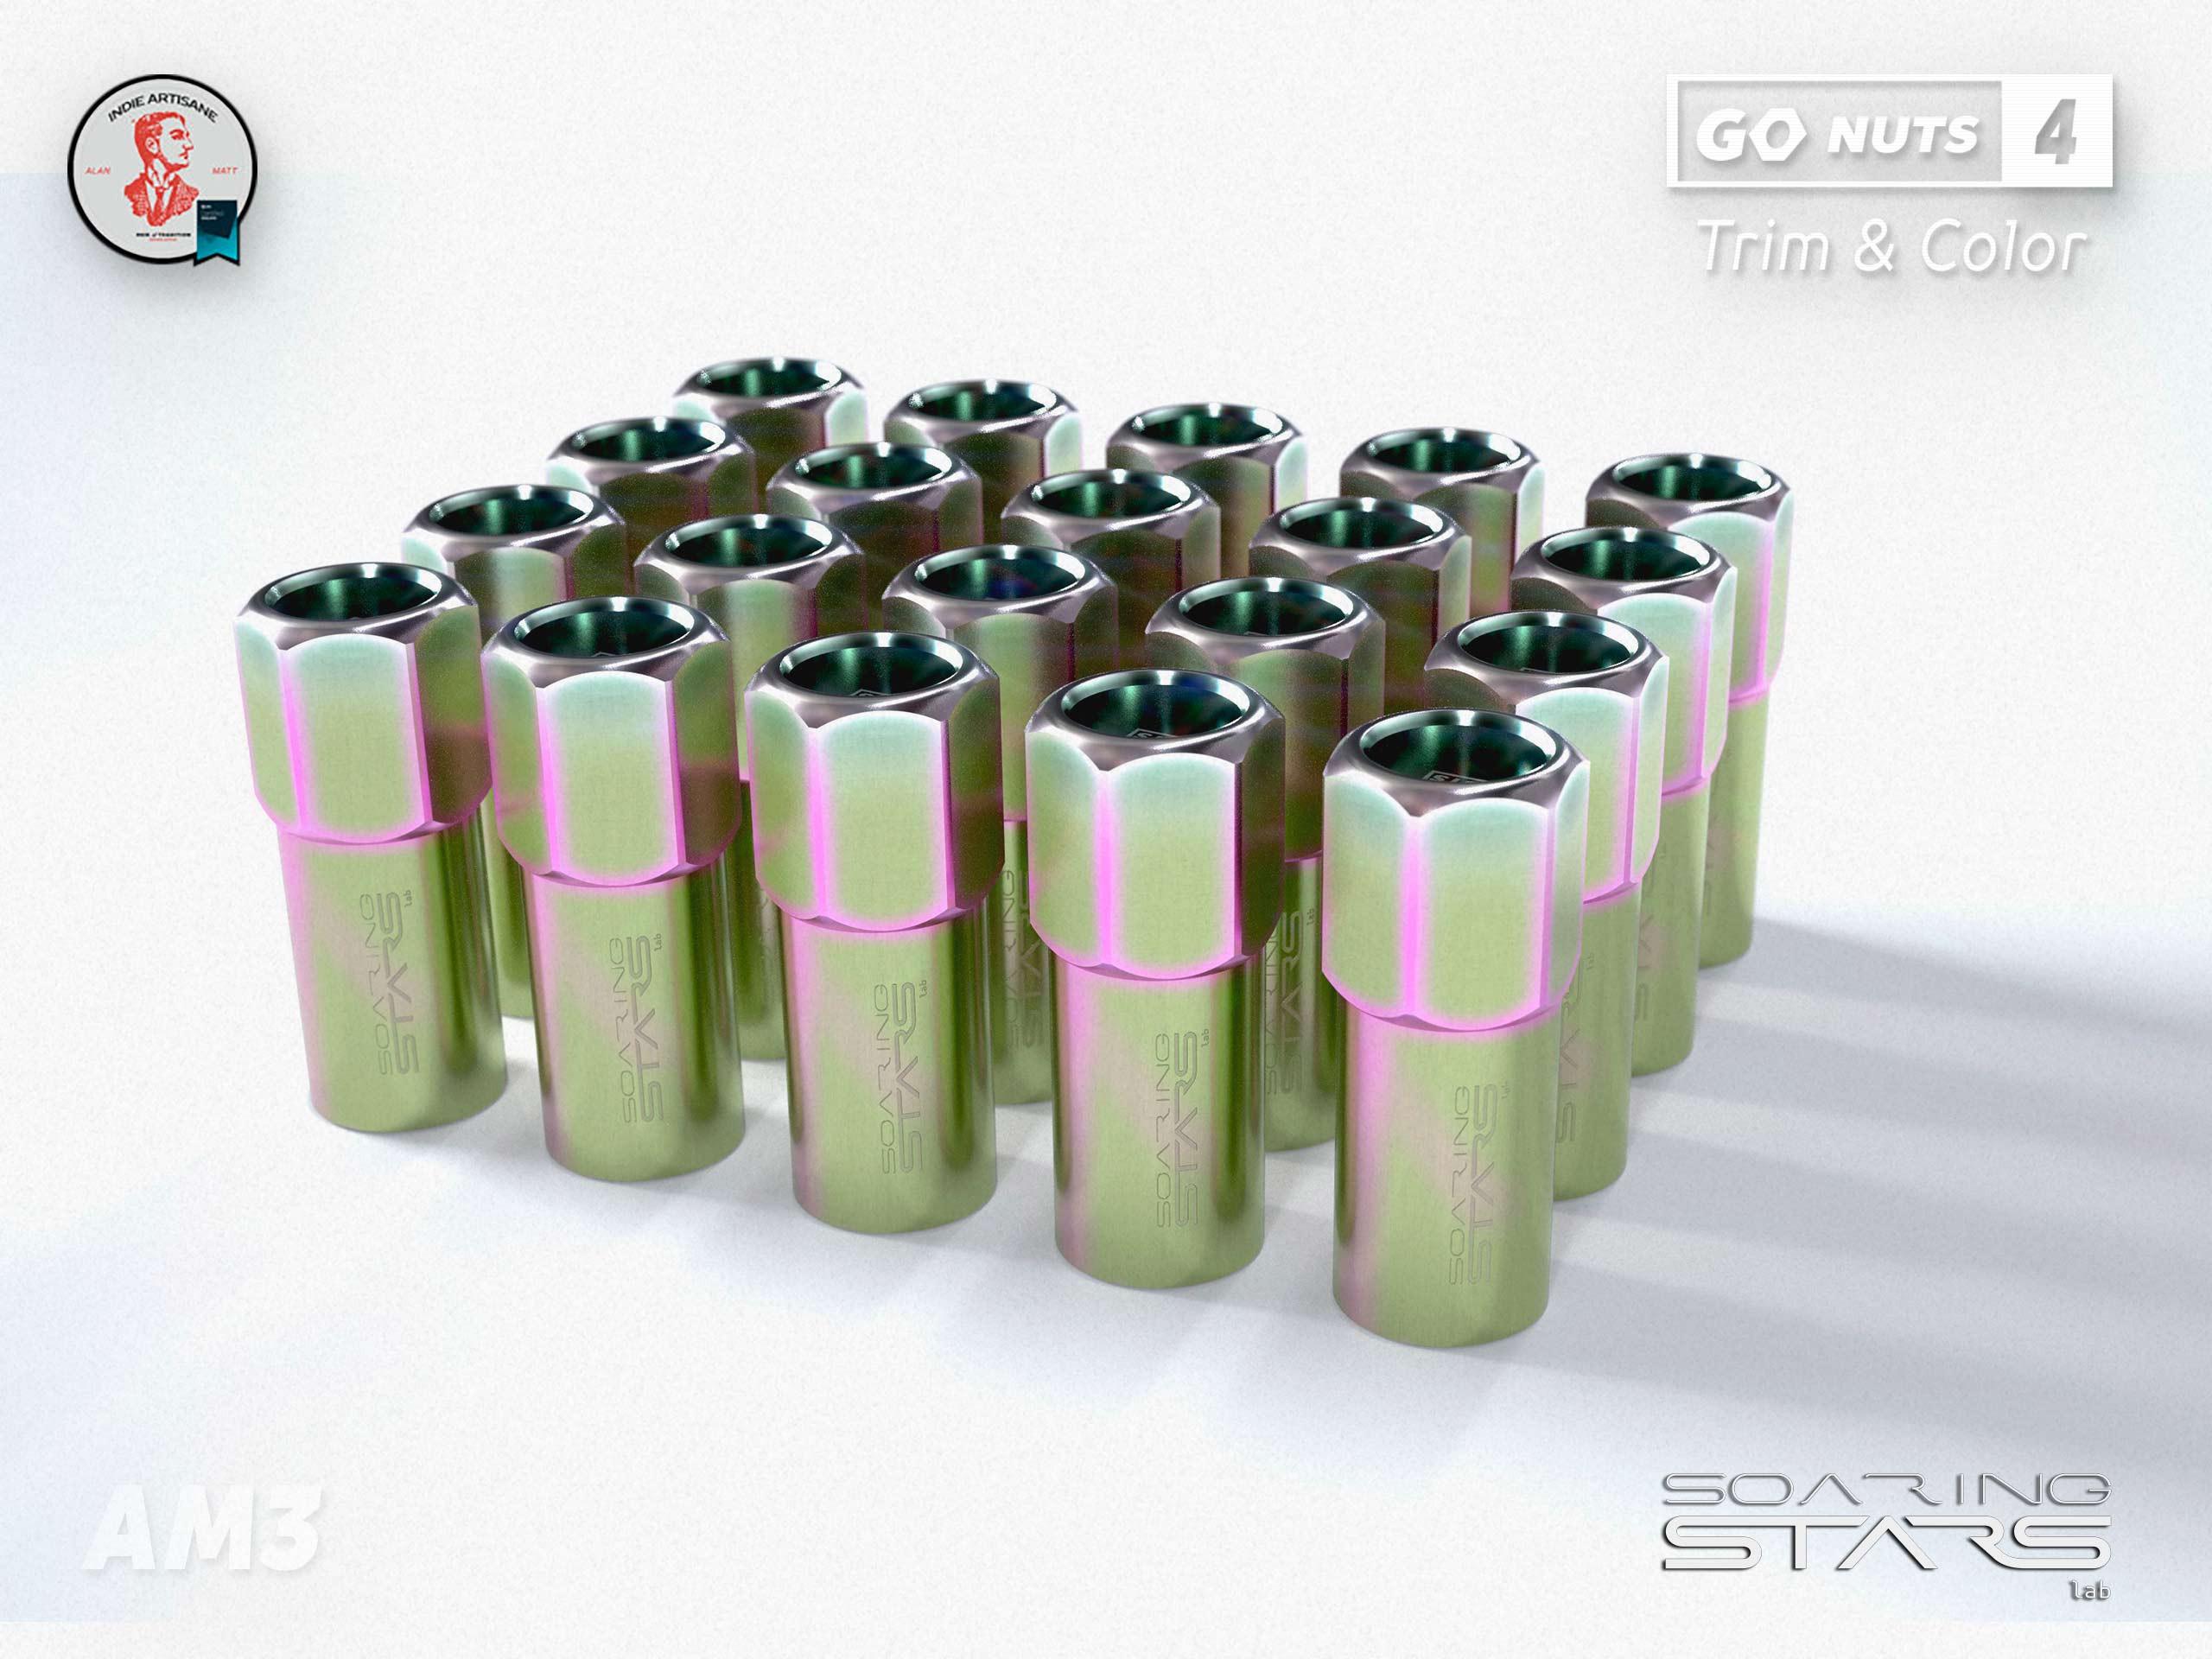 Soaring Stars lab, neon color nuts